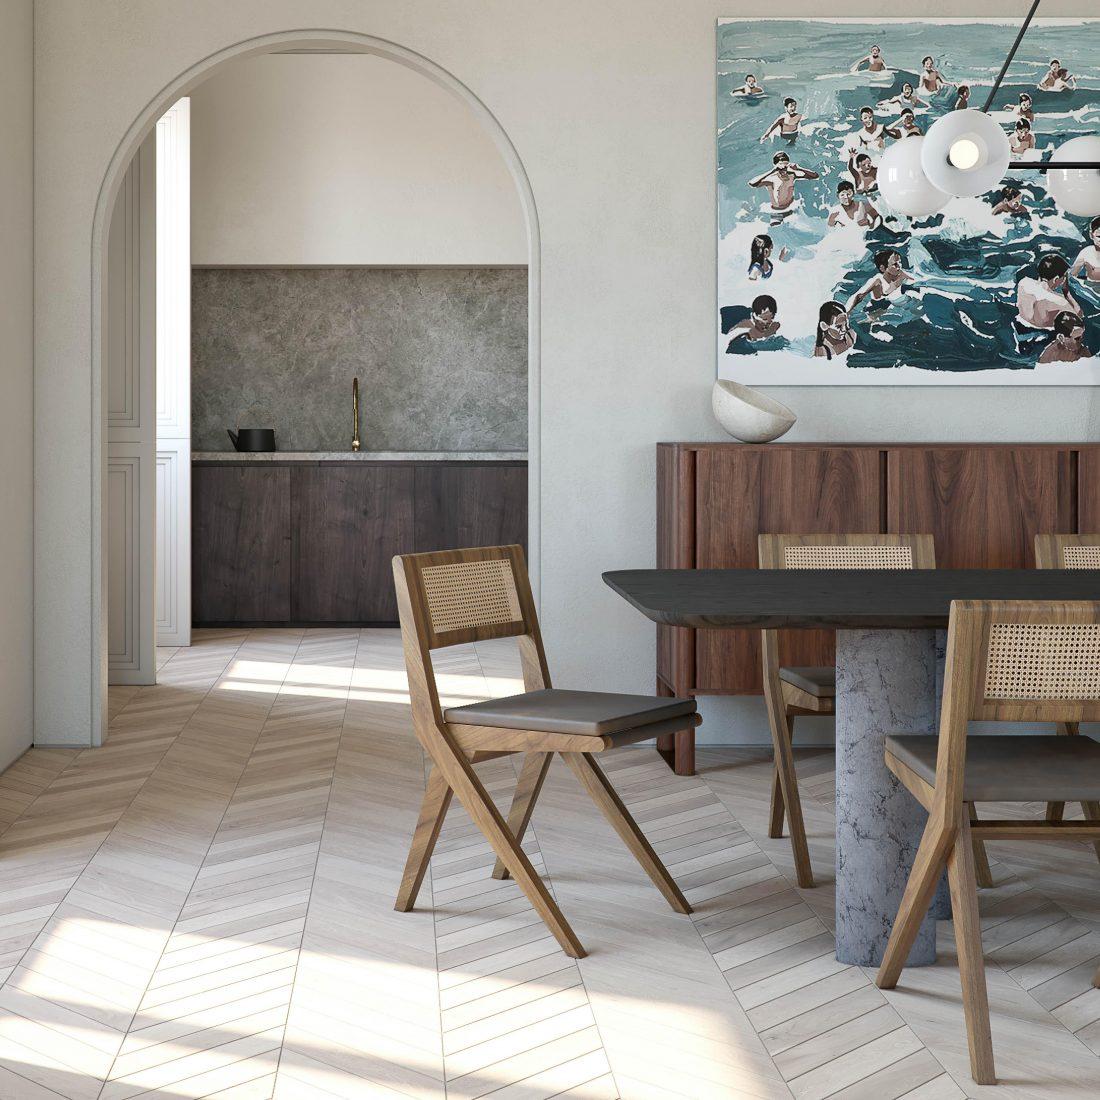 Design Anthology - Paris Apartment